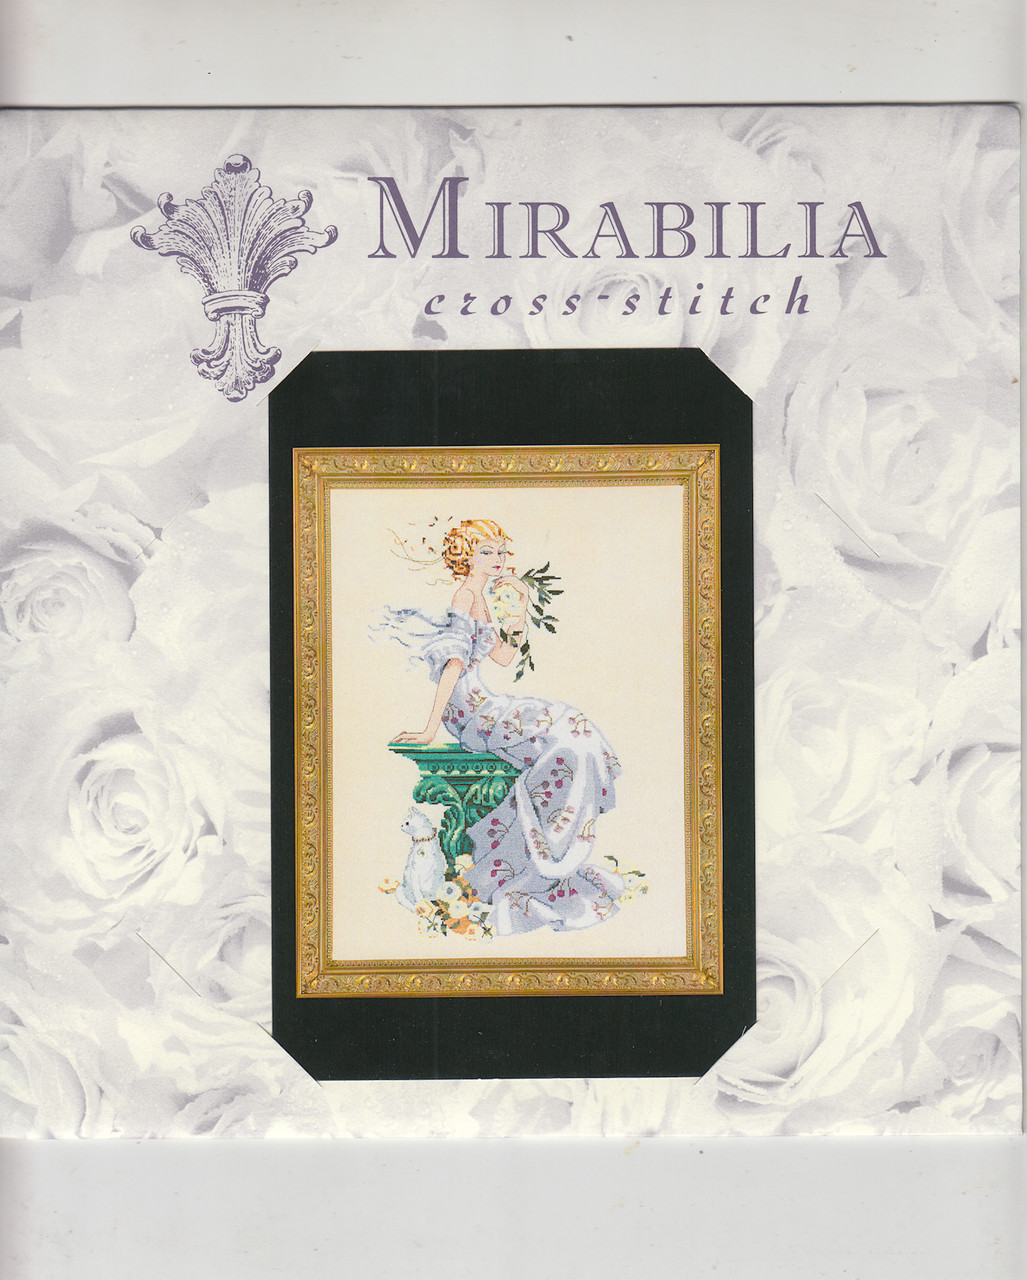 Mirabilia - Florentina